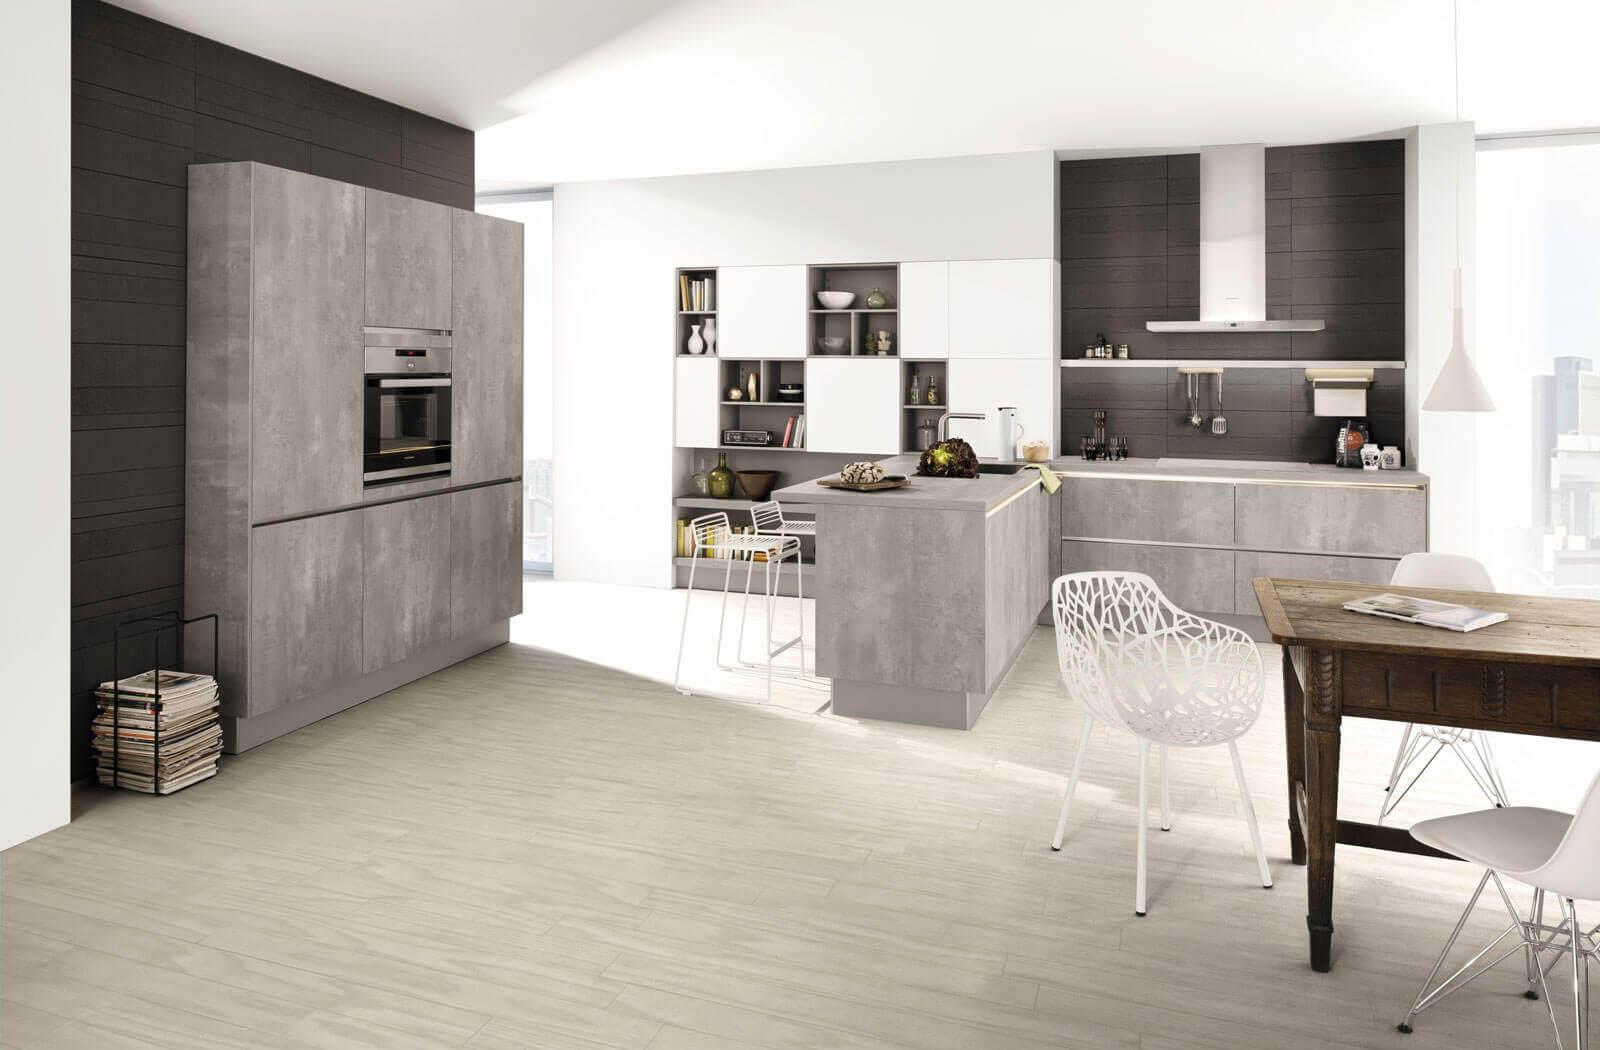 beton cir g nstige arbeitsplatte in beton optik k chenfinder magazin. Black Bedroom Furniture Sets. Home Design Ideas